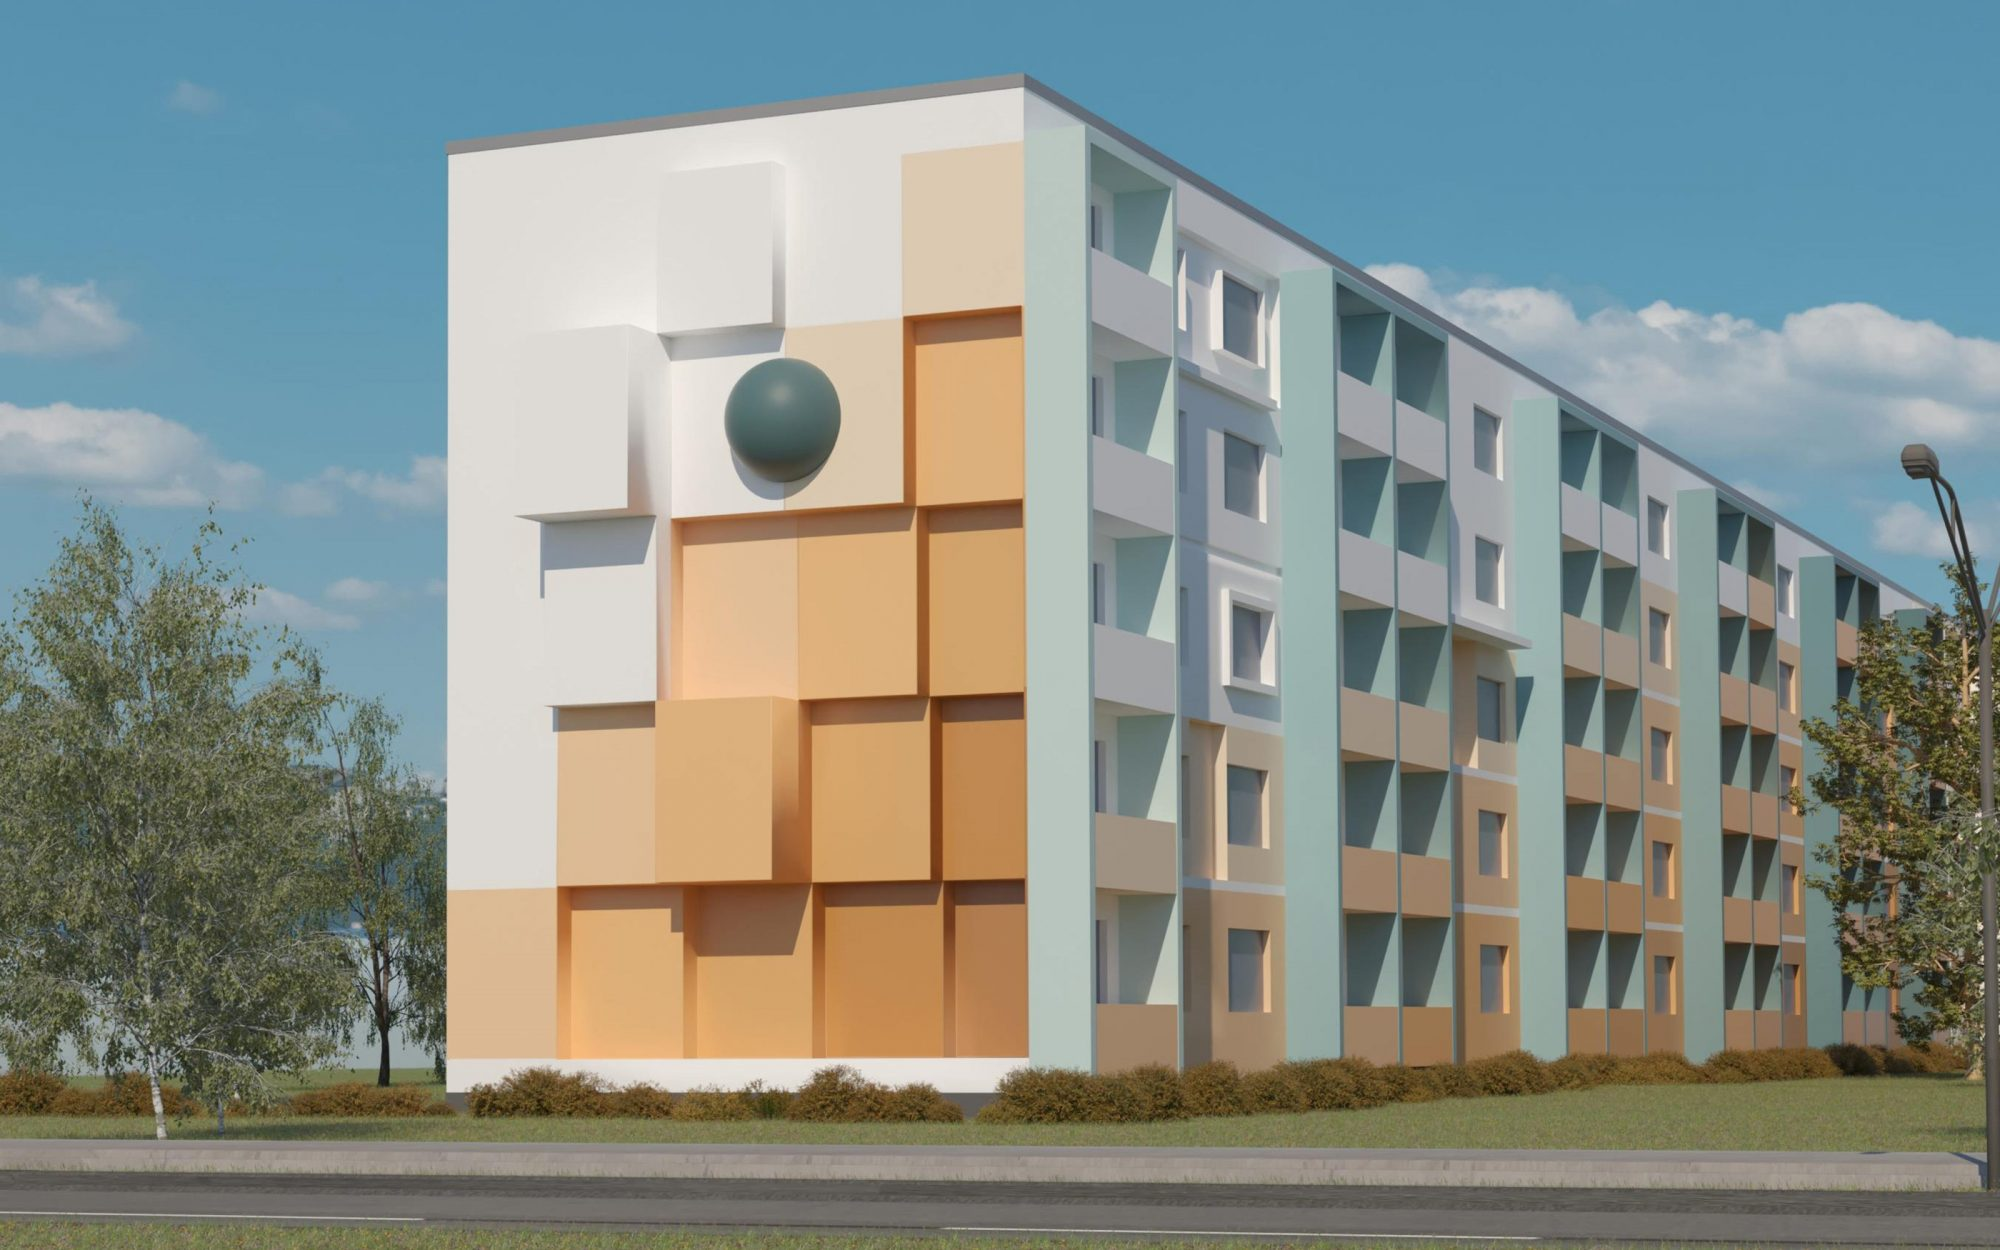 GRACO-Neuruppin-Rendering-Fassadengestaltung-Entwurf-Design